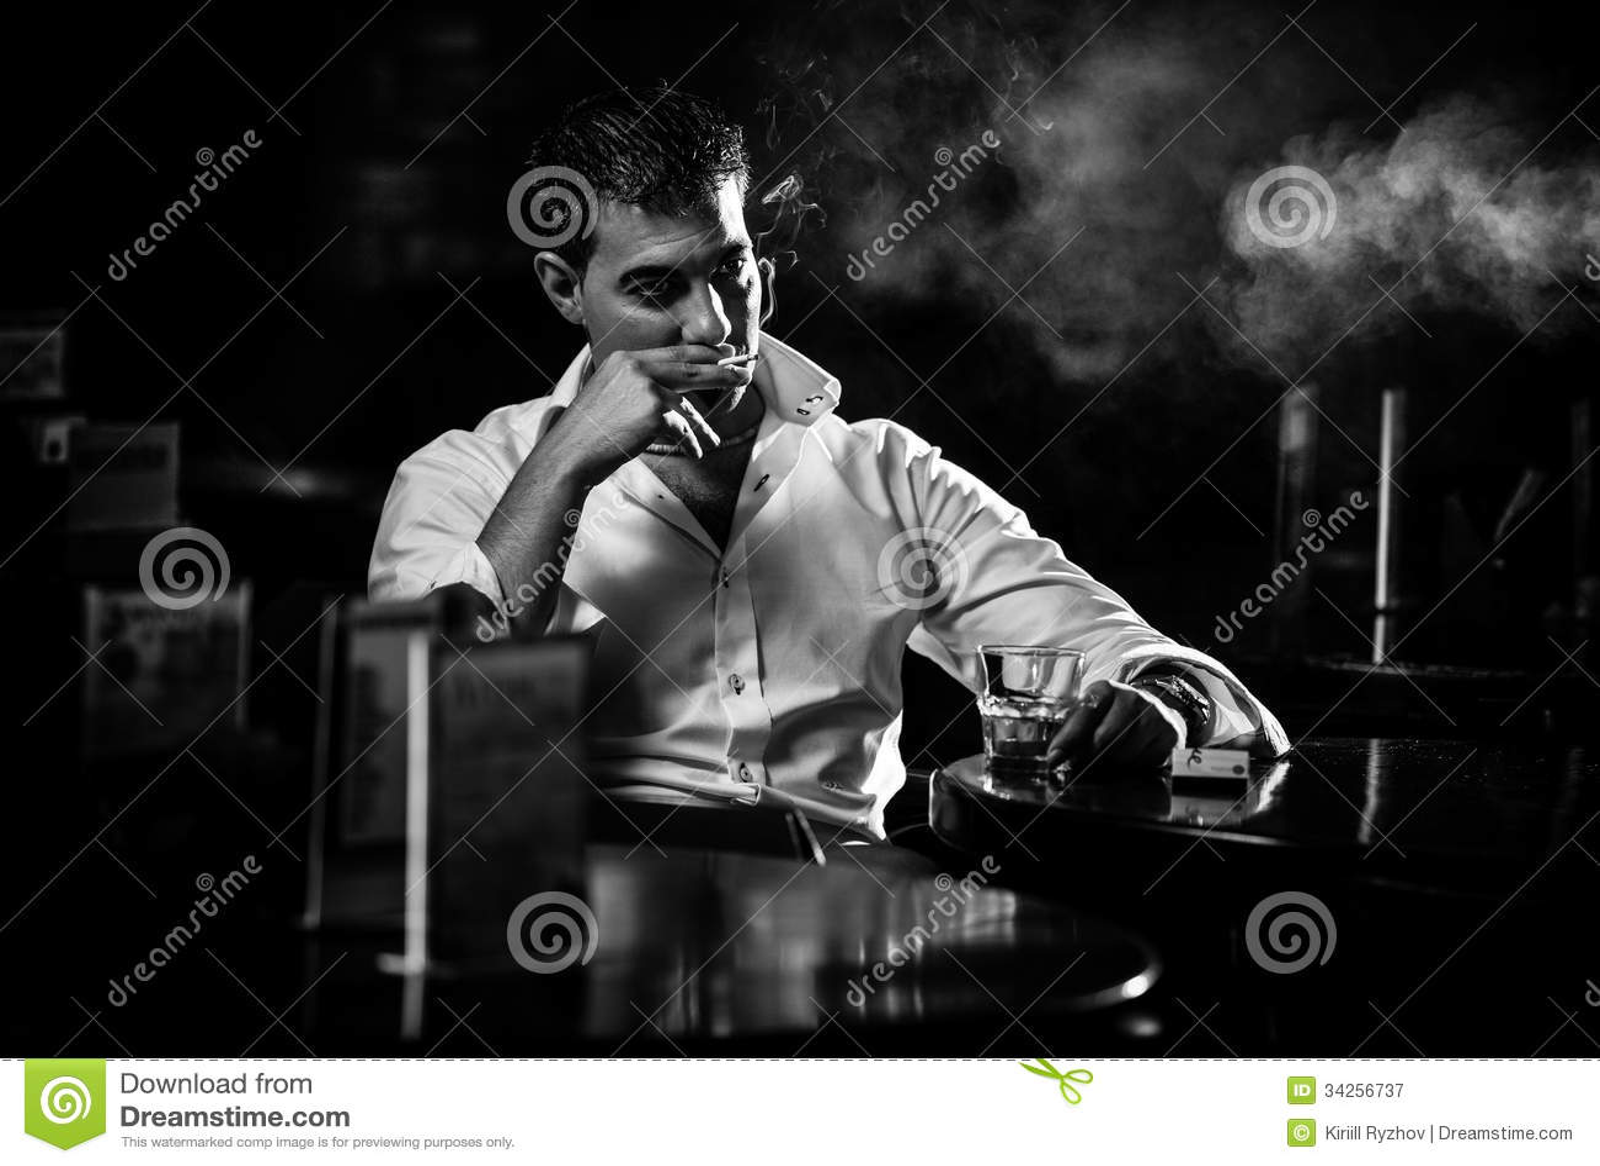 Man Smoking Cigarette In Restaurant Stock Image Image